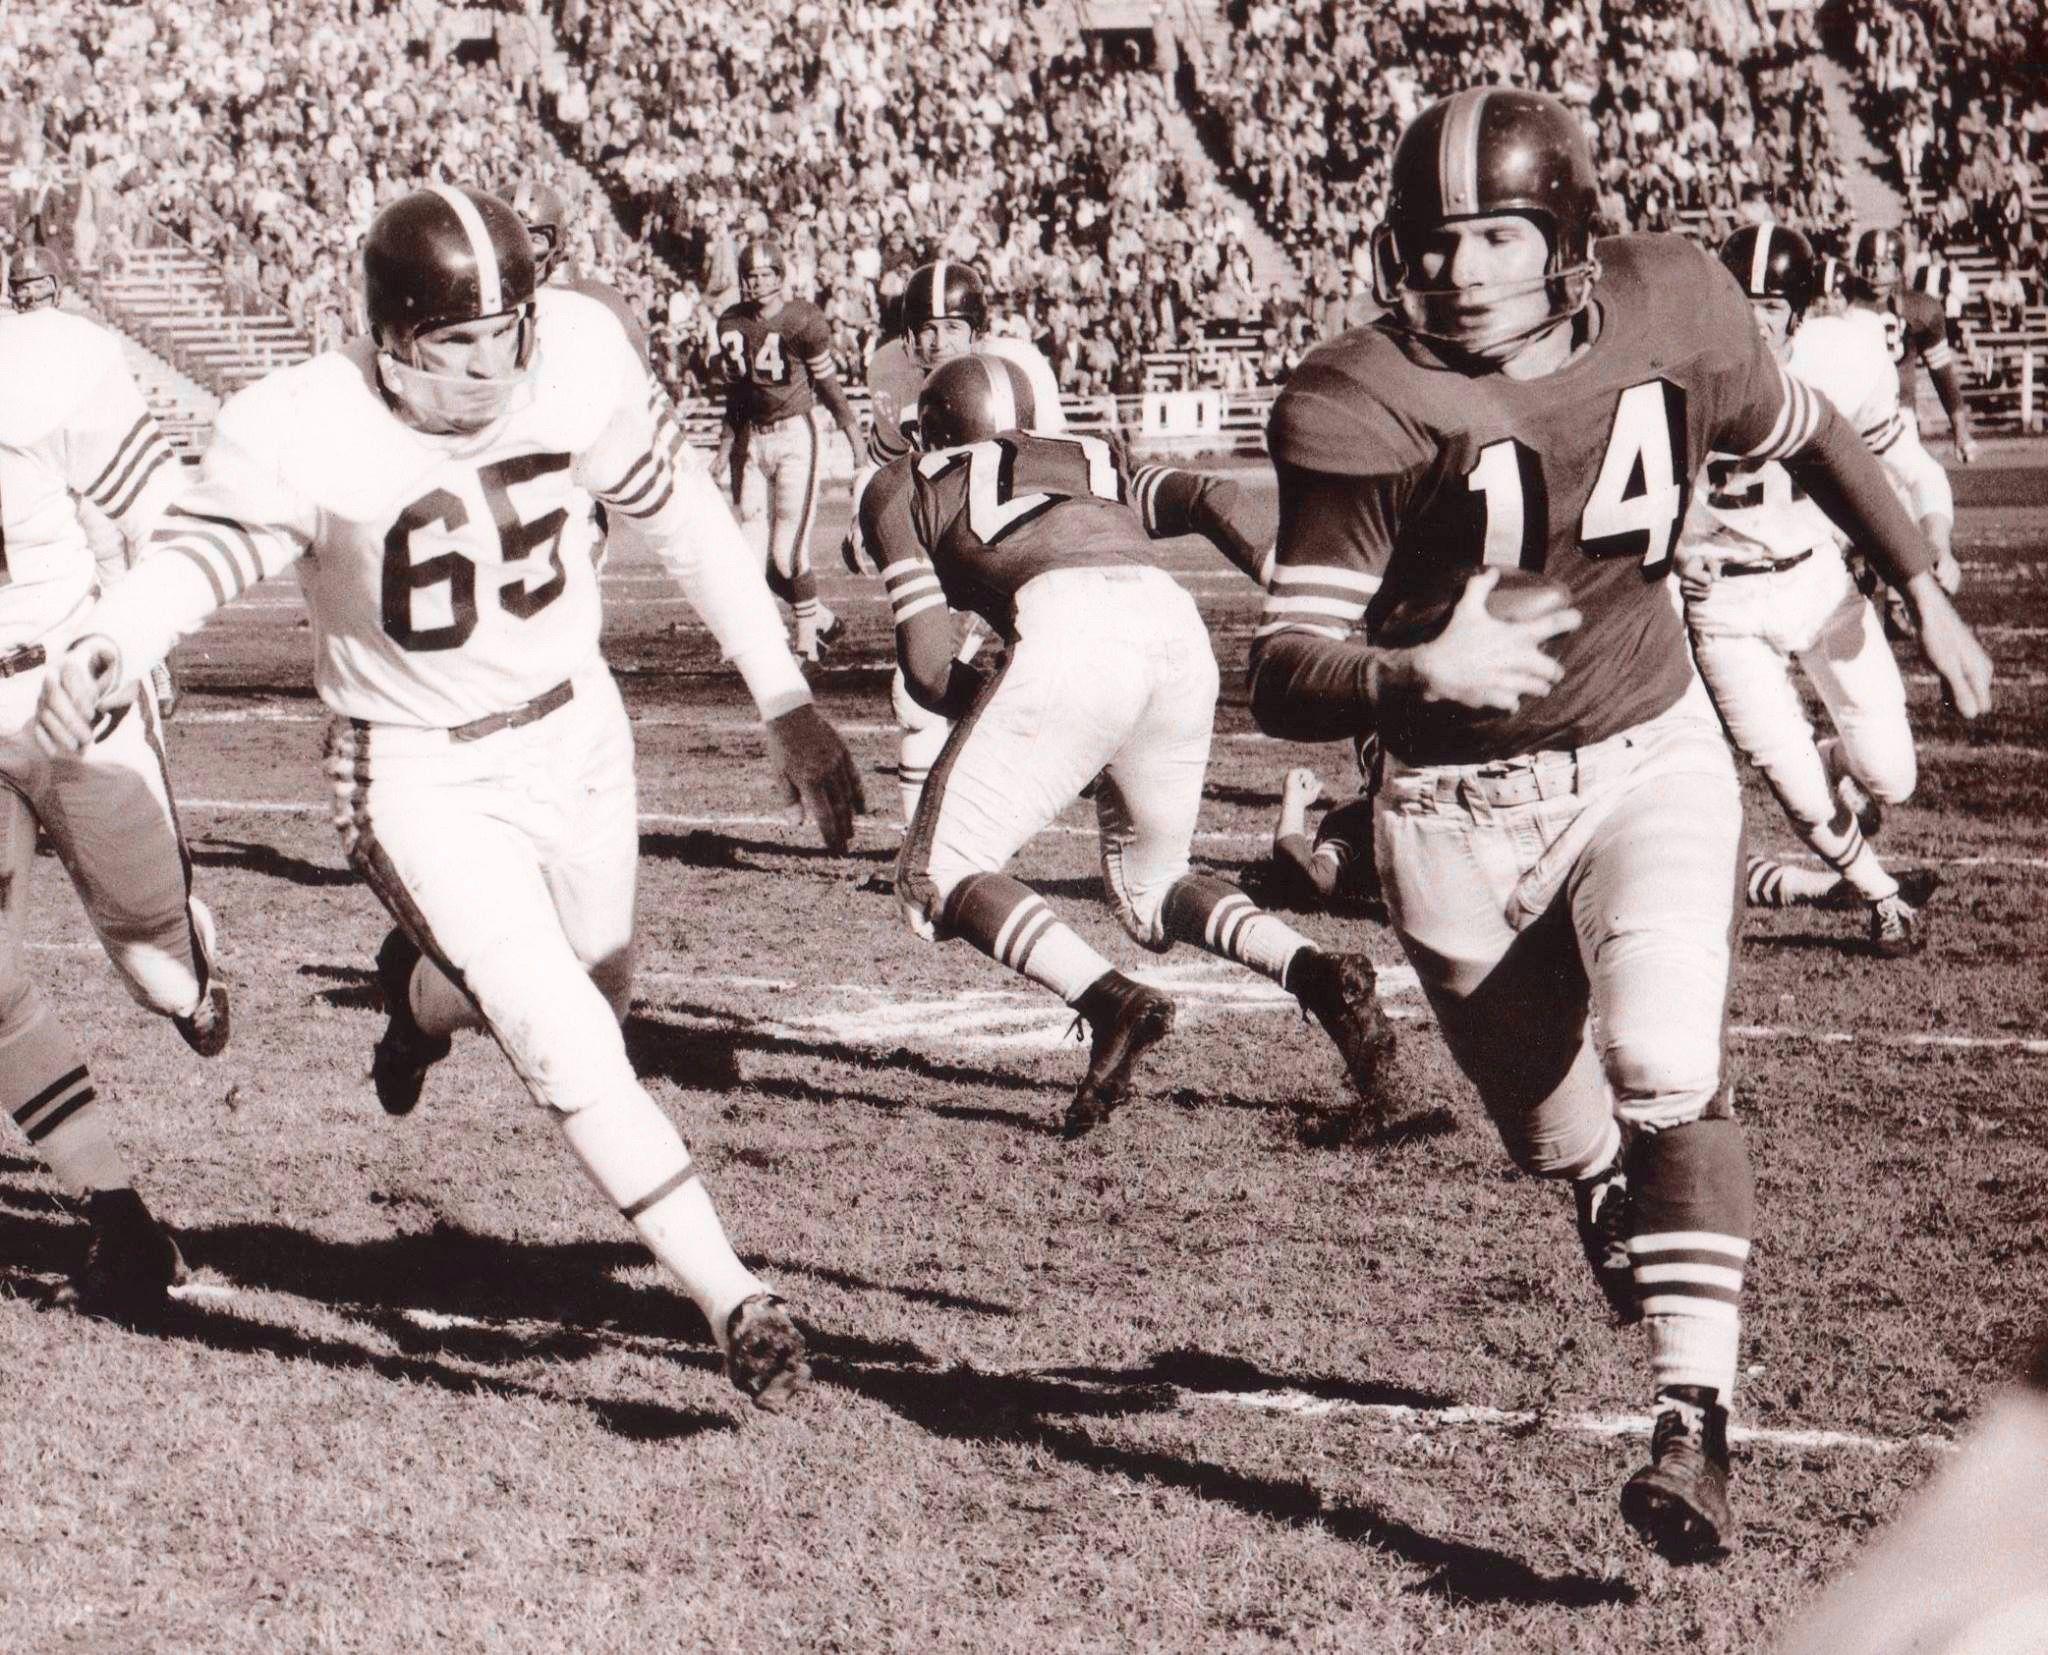 San Francisco (14 Y.A. Tittle) vs Baltimore Colts